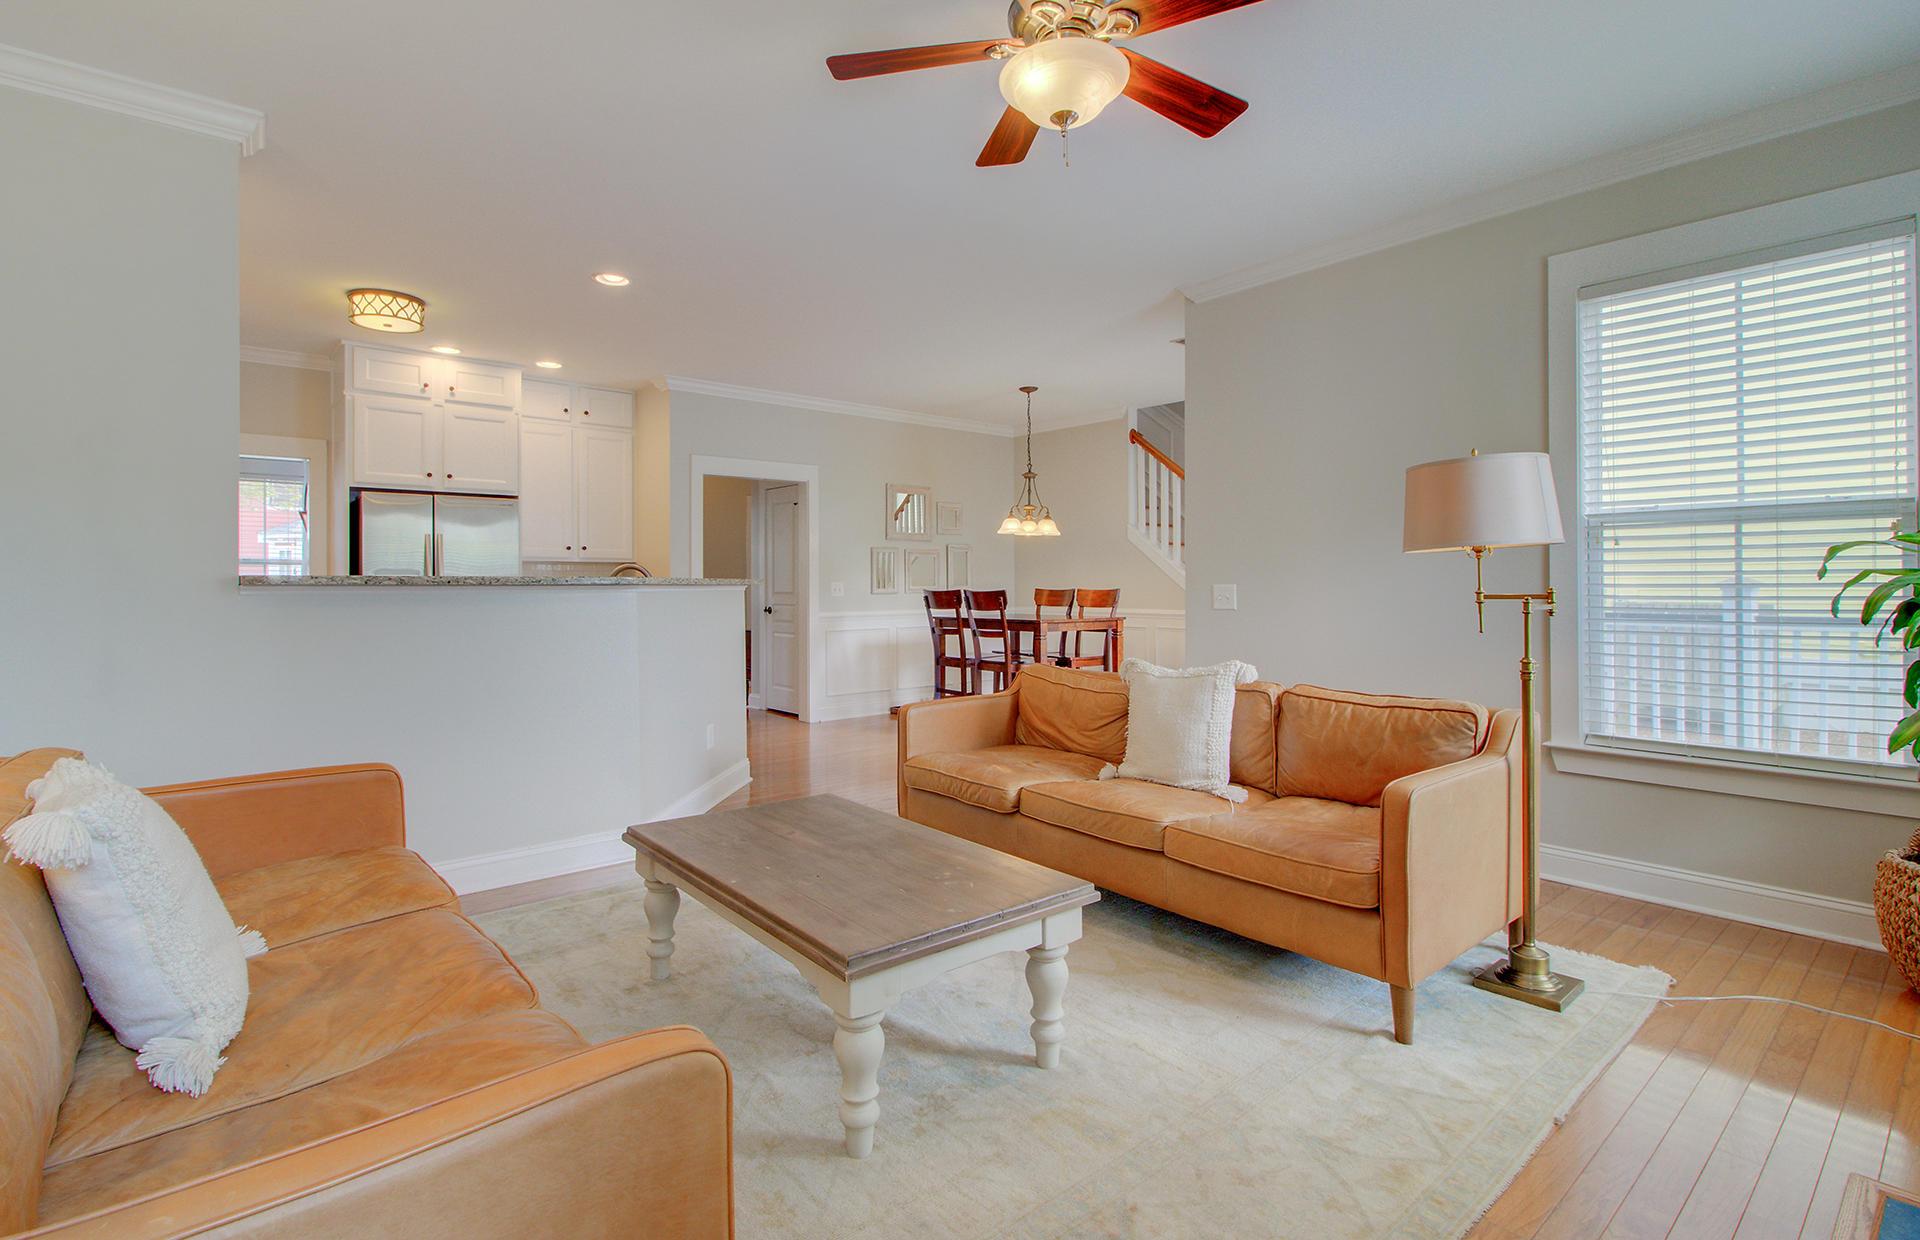 New Parrish Village Homes For Sale - 1109 Dawn View, Mount Pleasant, SC - 16